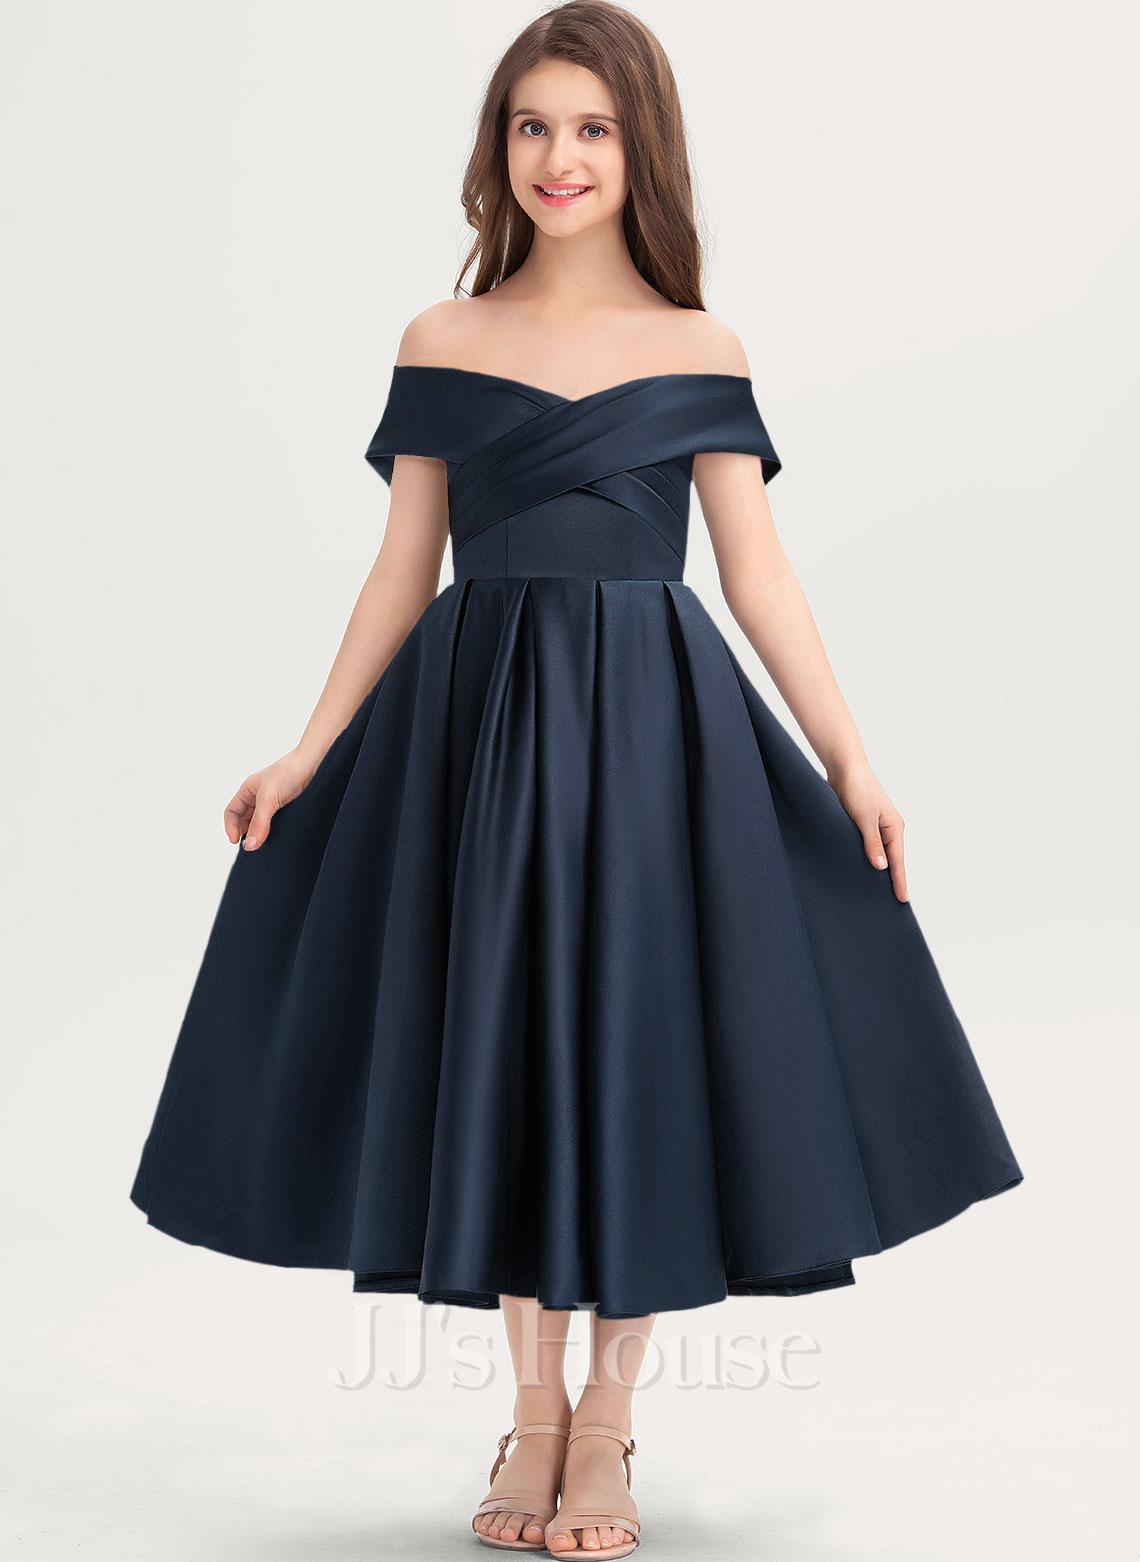 A-Line Off-the-Shoulder Tea-Length Satin Junior Bridesmaid Dress With Ruffle Pockets